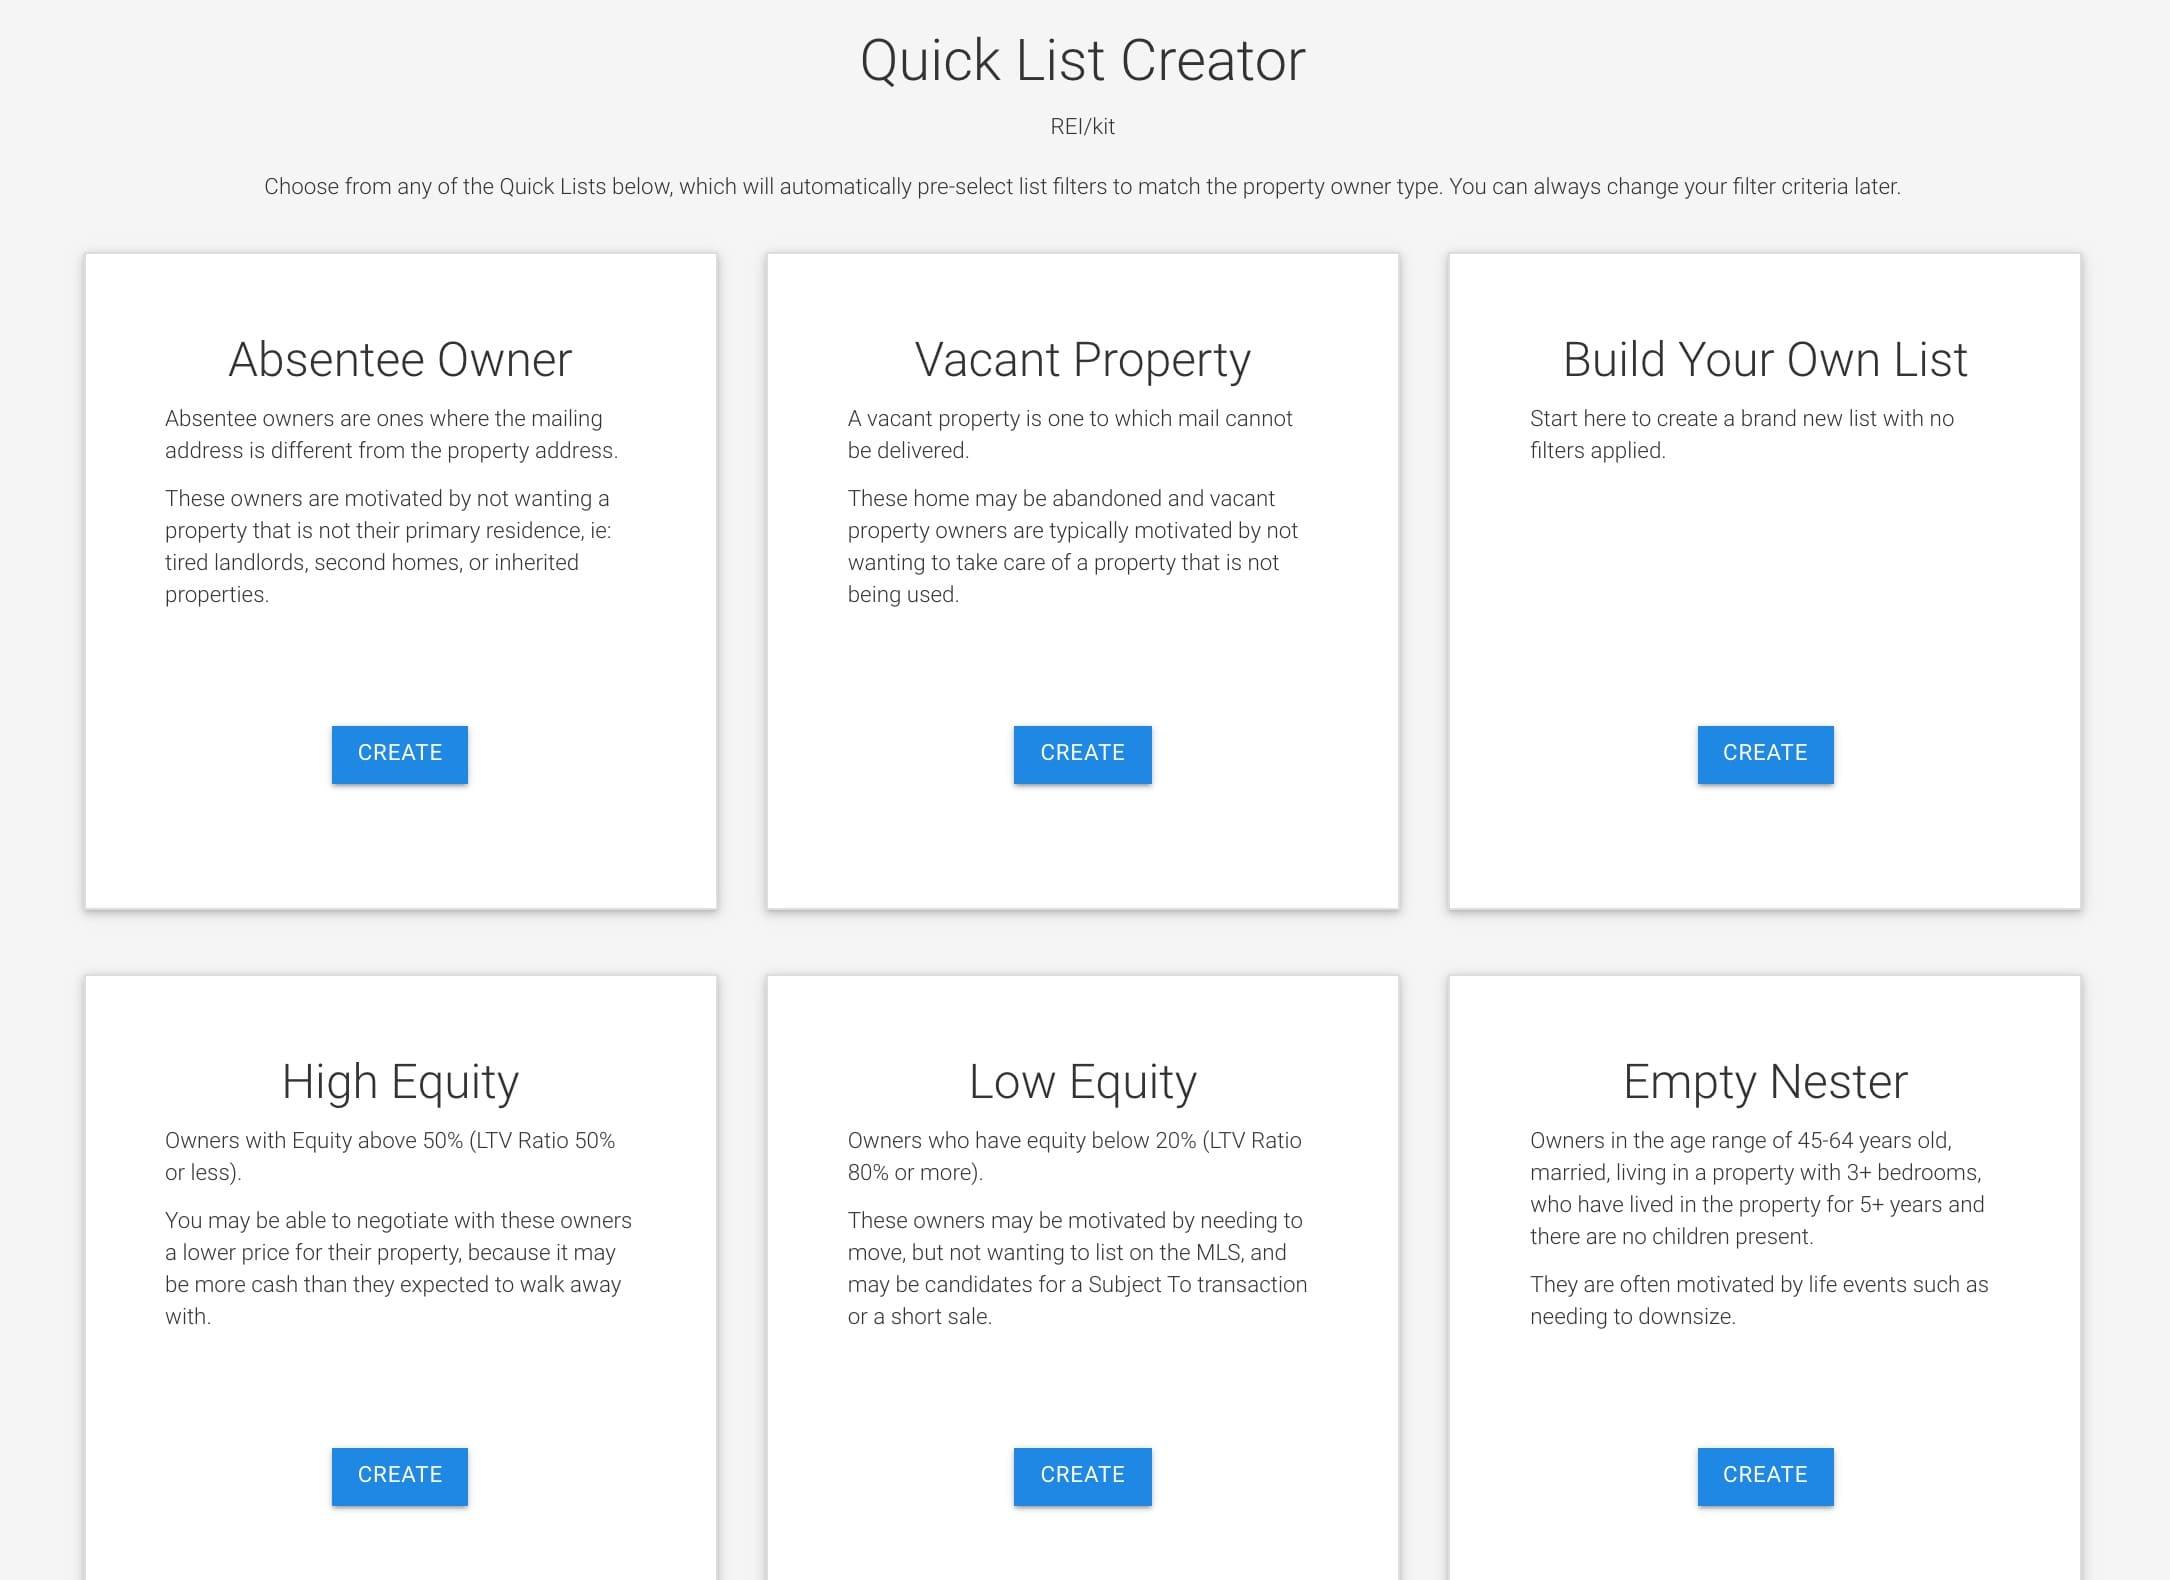 REIkit Leads List Tool Quick List Creator Screen